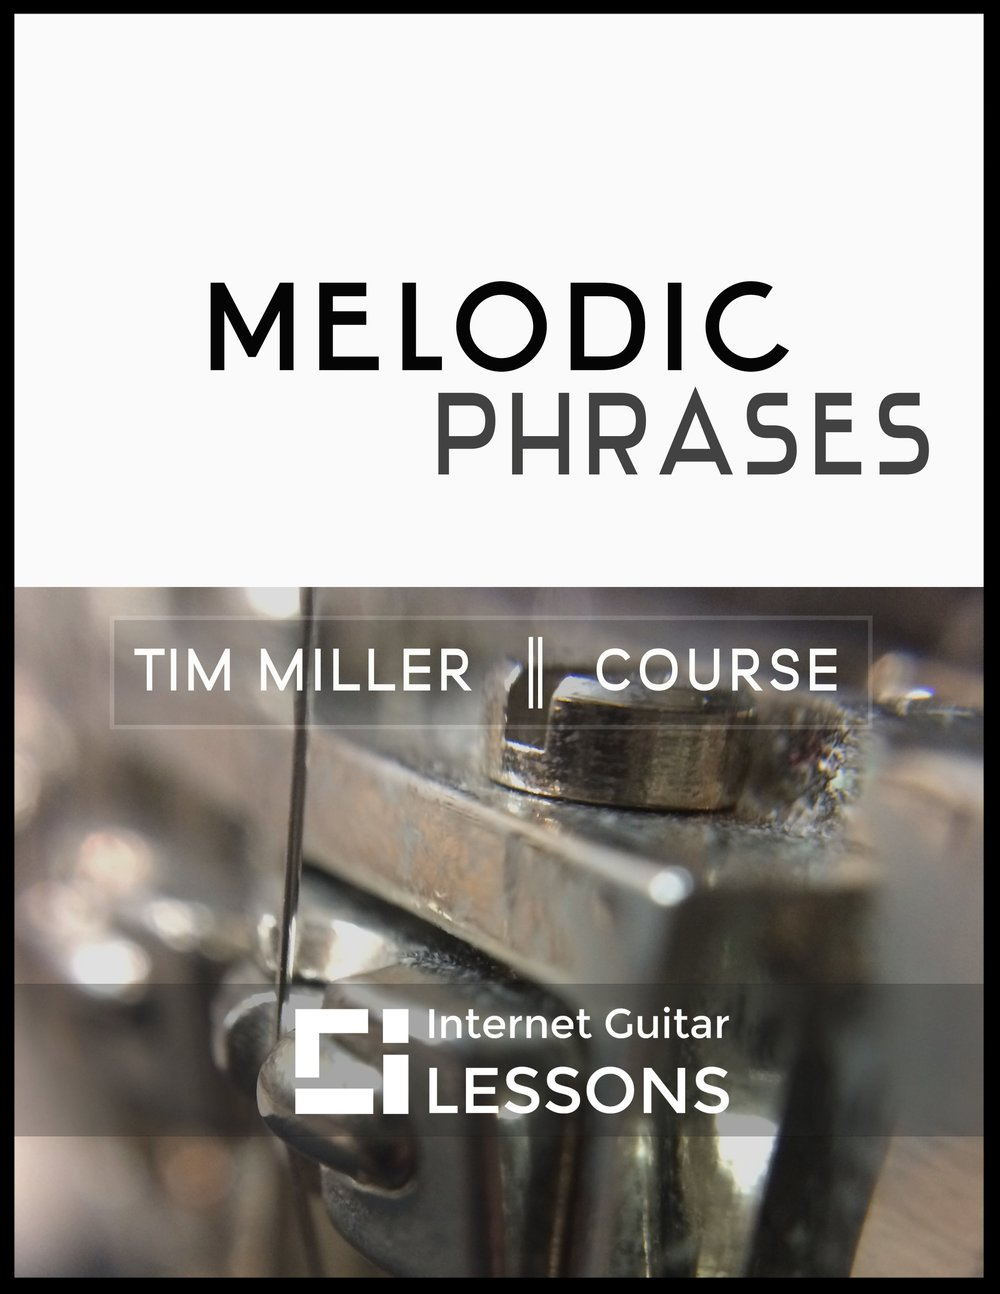 Melodic Phrases 1.17 flat.jpg